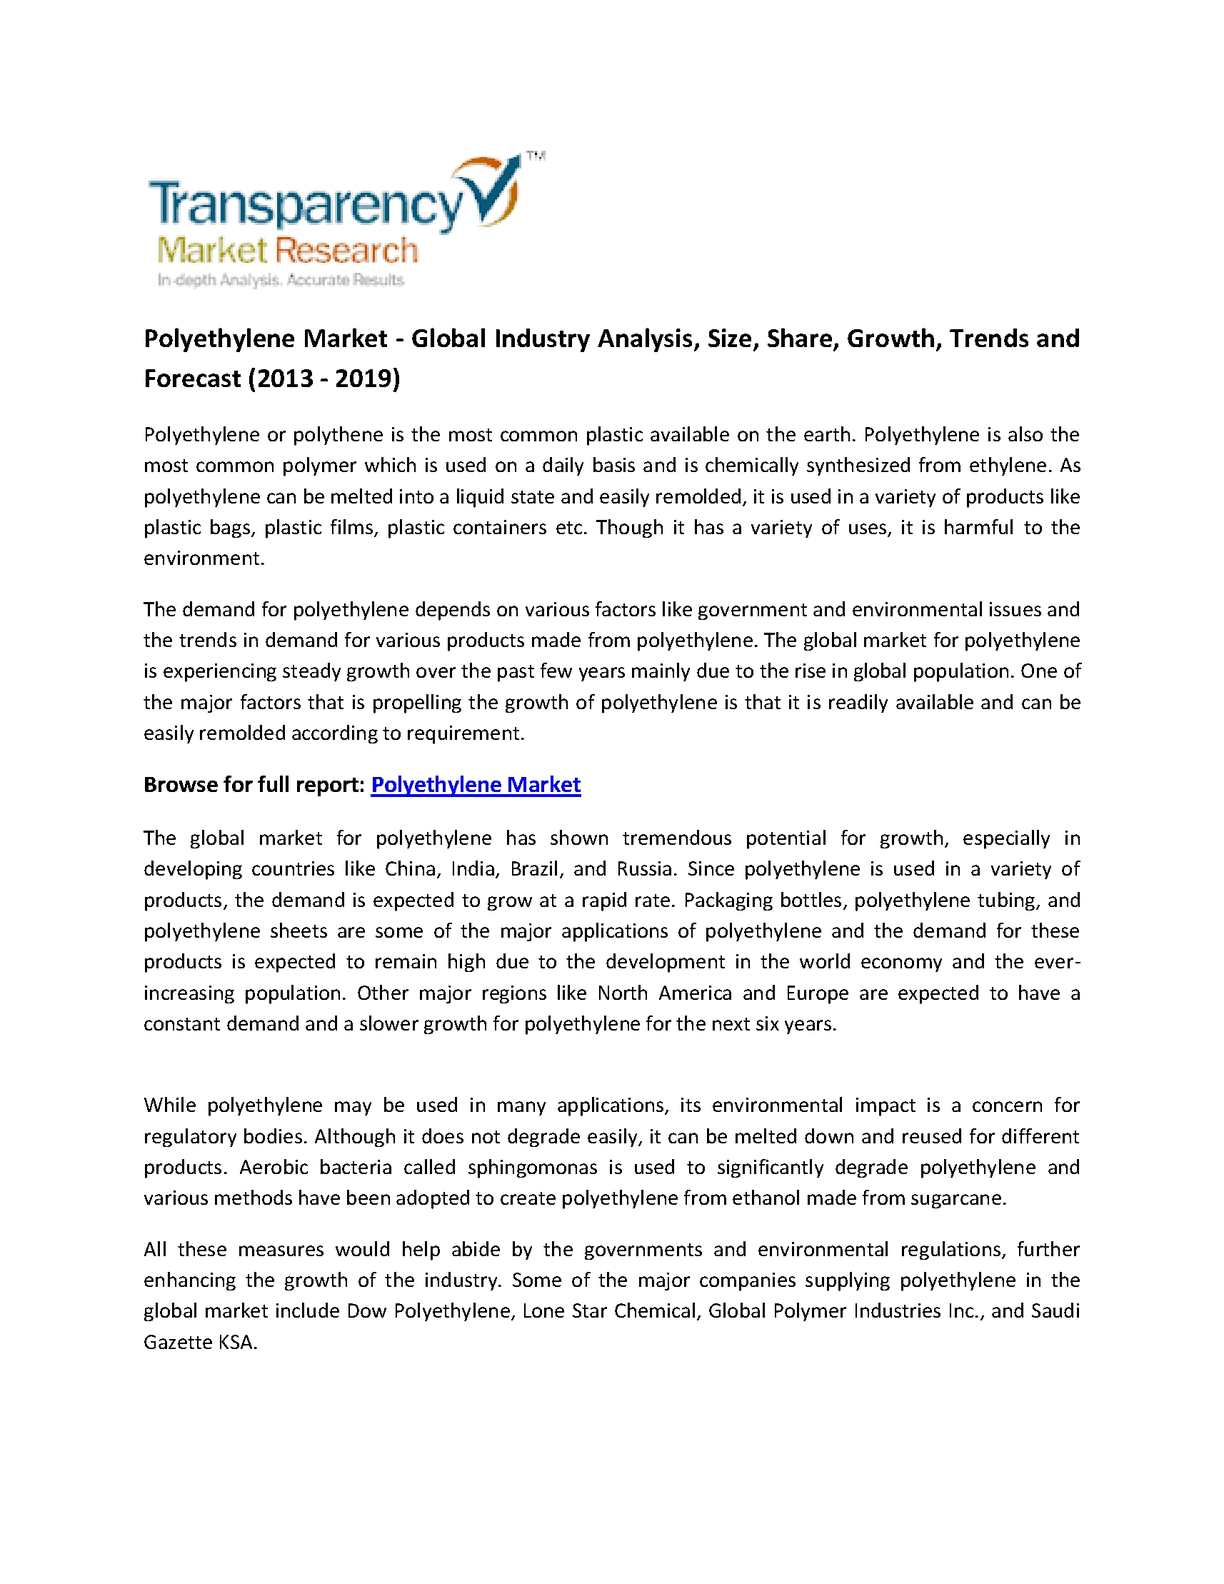 Calaméo - Global Polyethylene Market - Industry Analysis